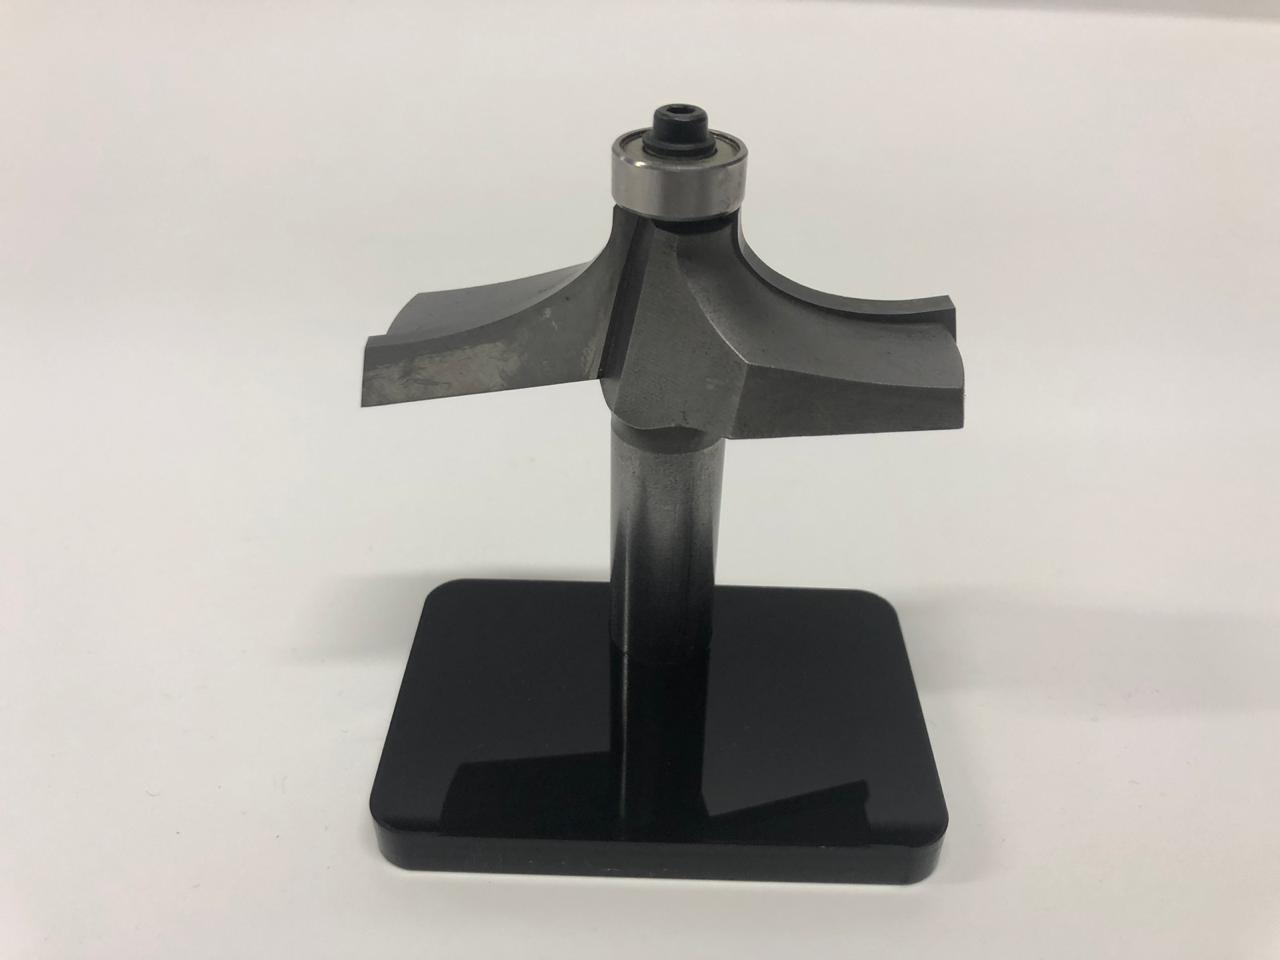 Maxi Handrail